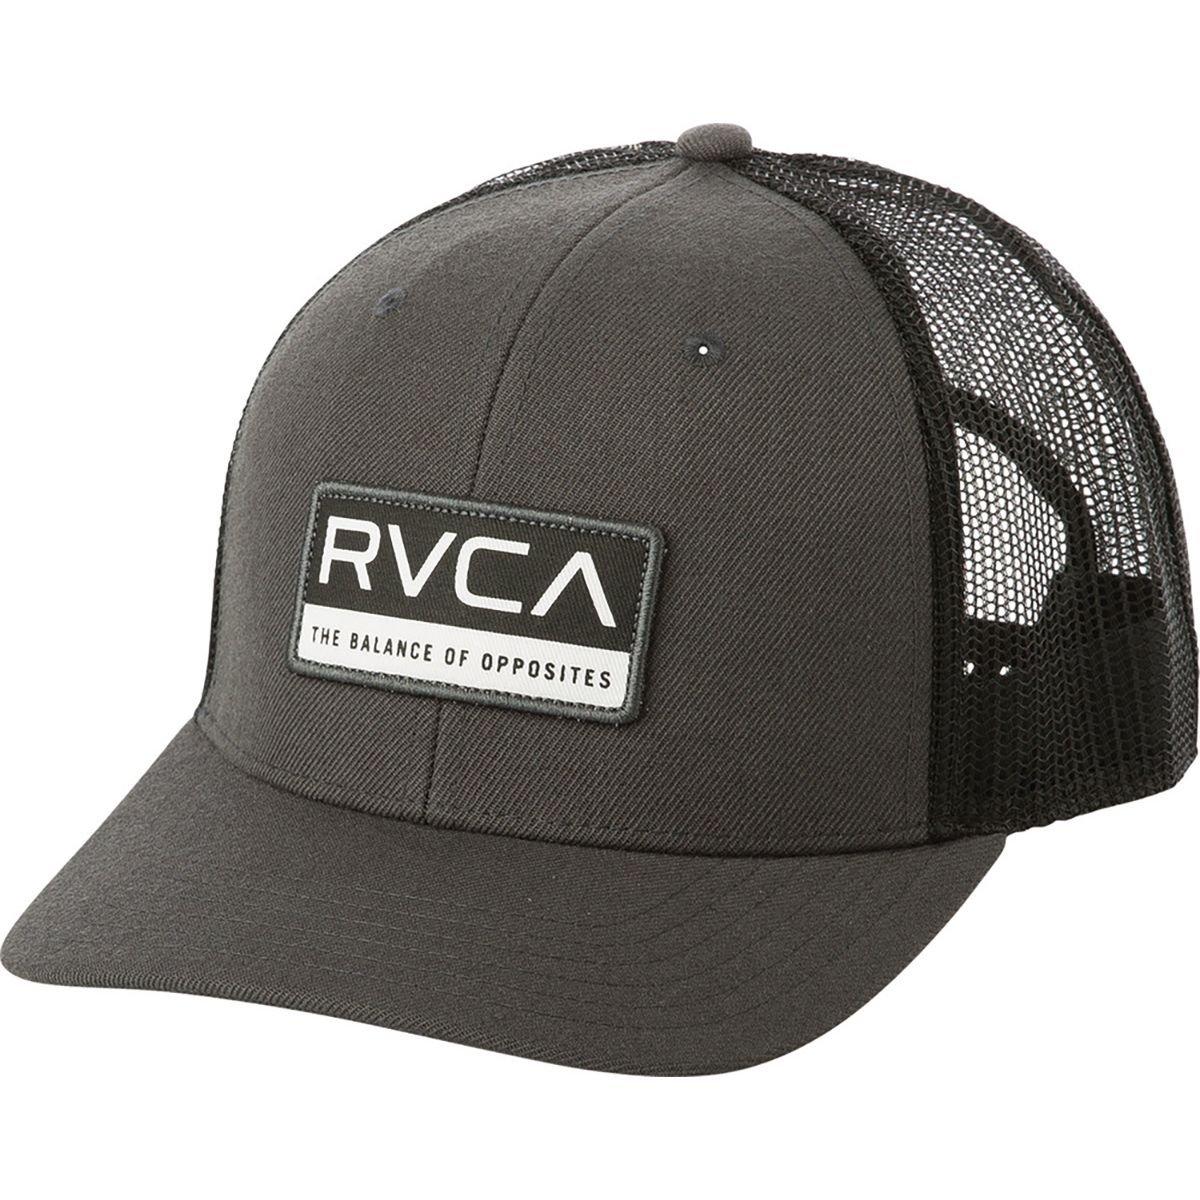 designer fashion d5fe2 63fd4 Amazon.com  RVCA Men s Reno Trucker Hat  Clothing